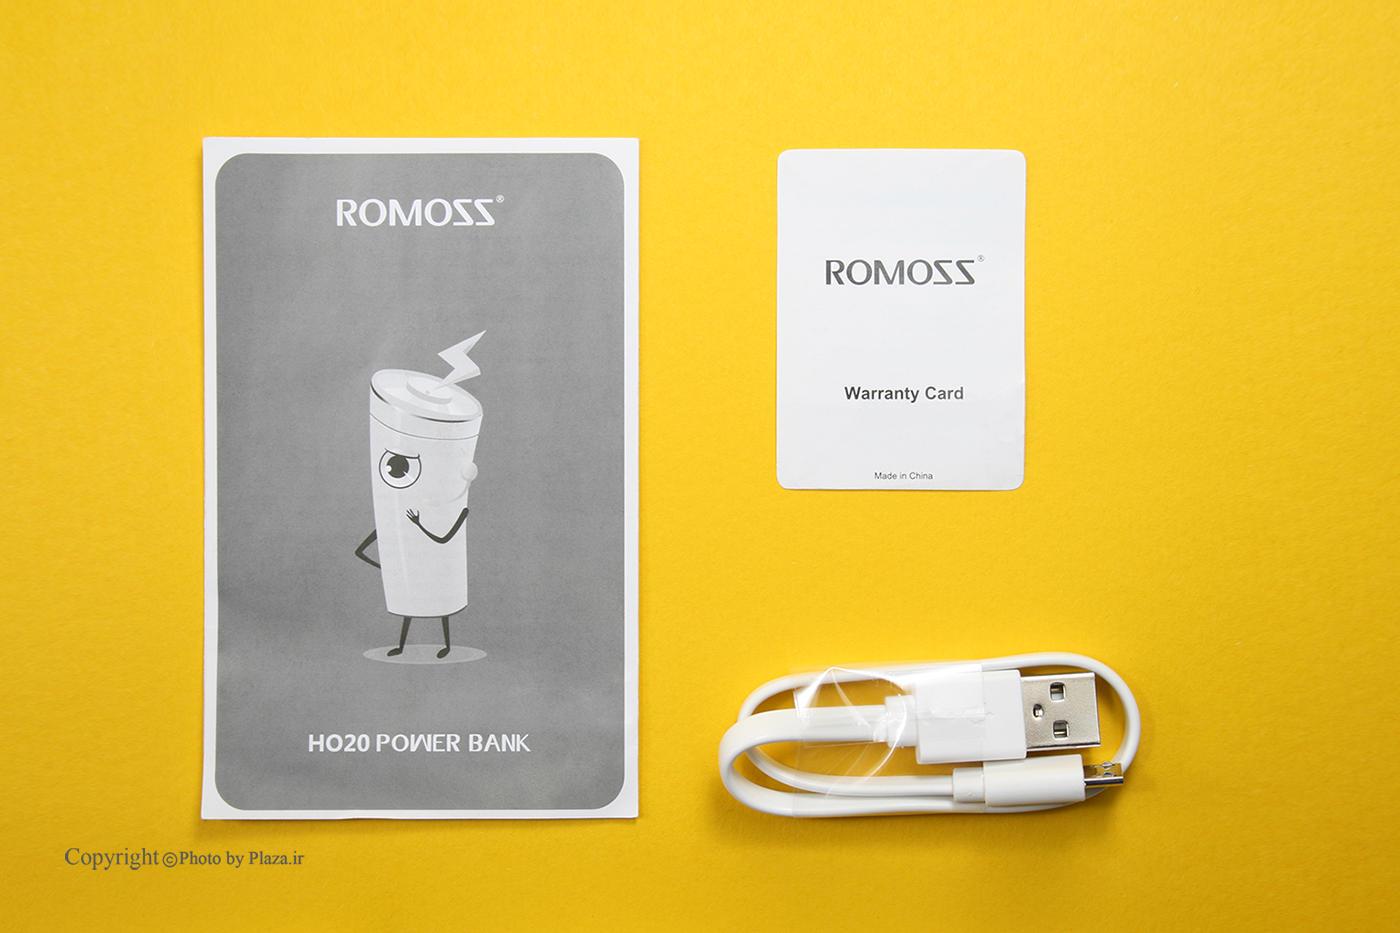 پاوربانک روموس مدل HO20 Horus